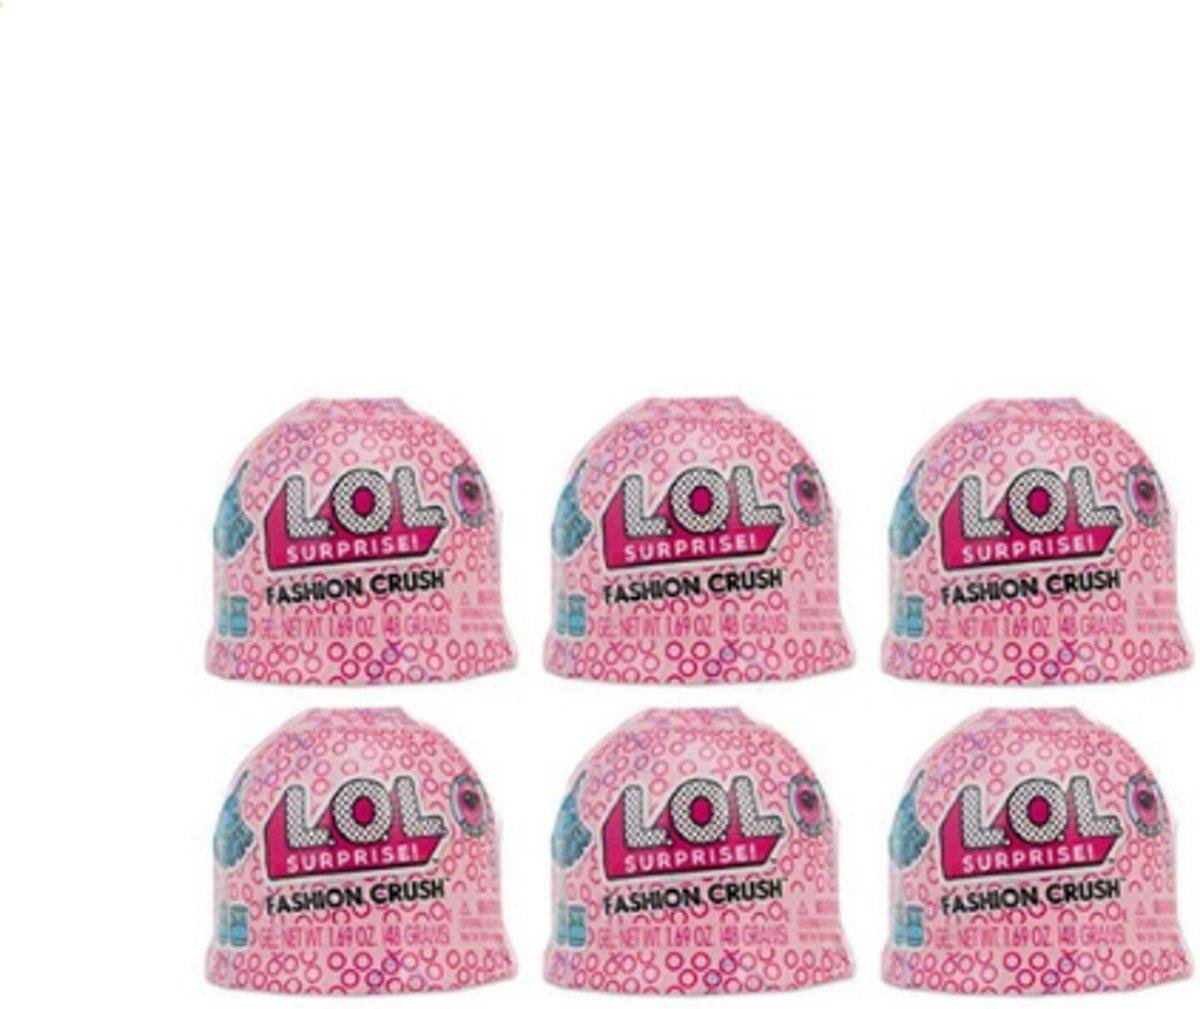 LOL Surprise Fashion Crush serie 4 ( 6-pack)